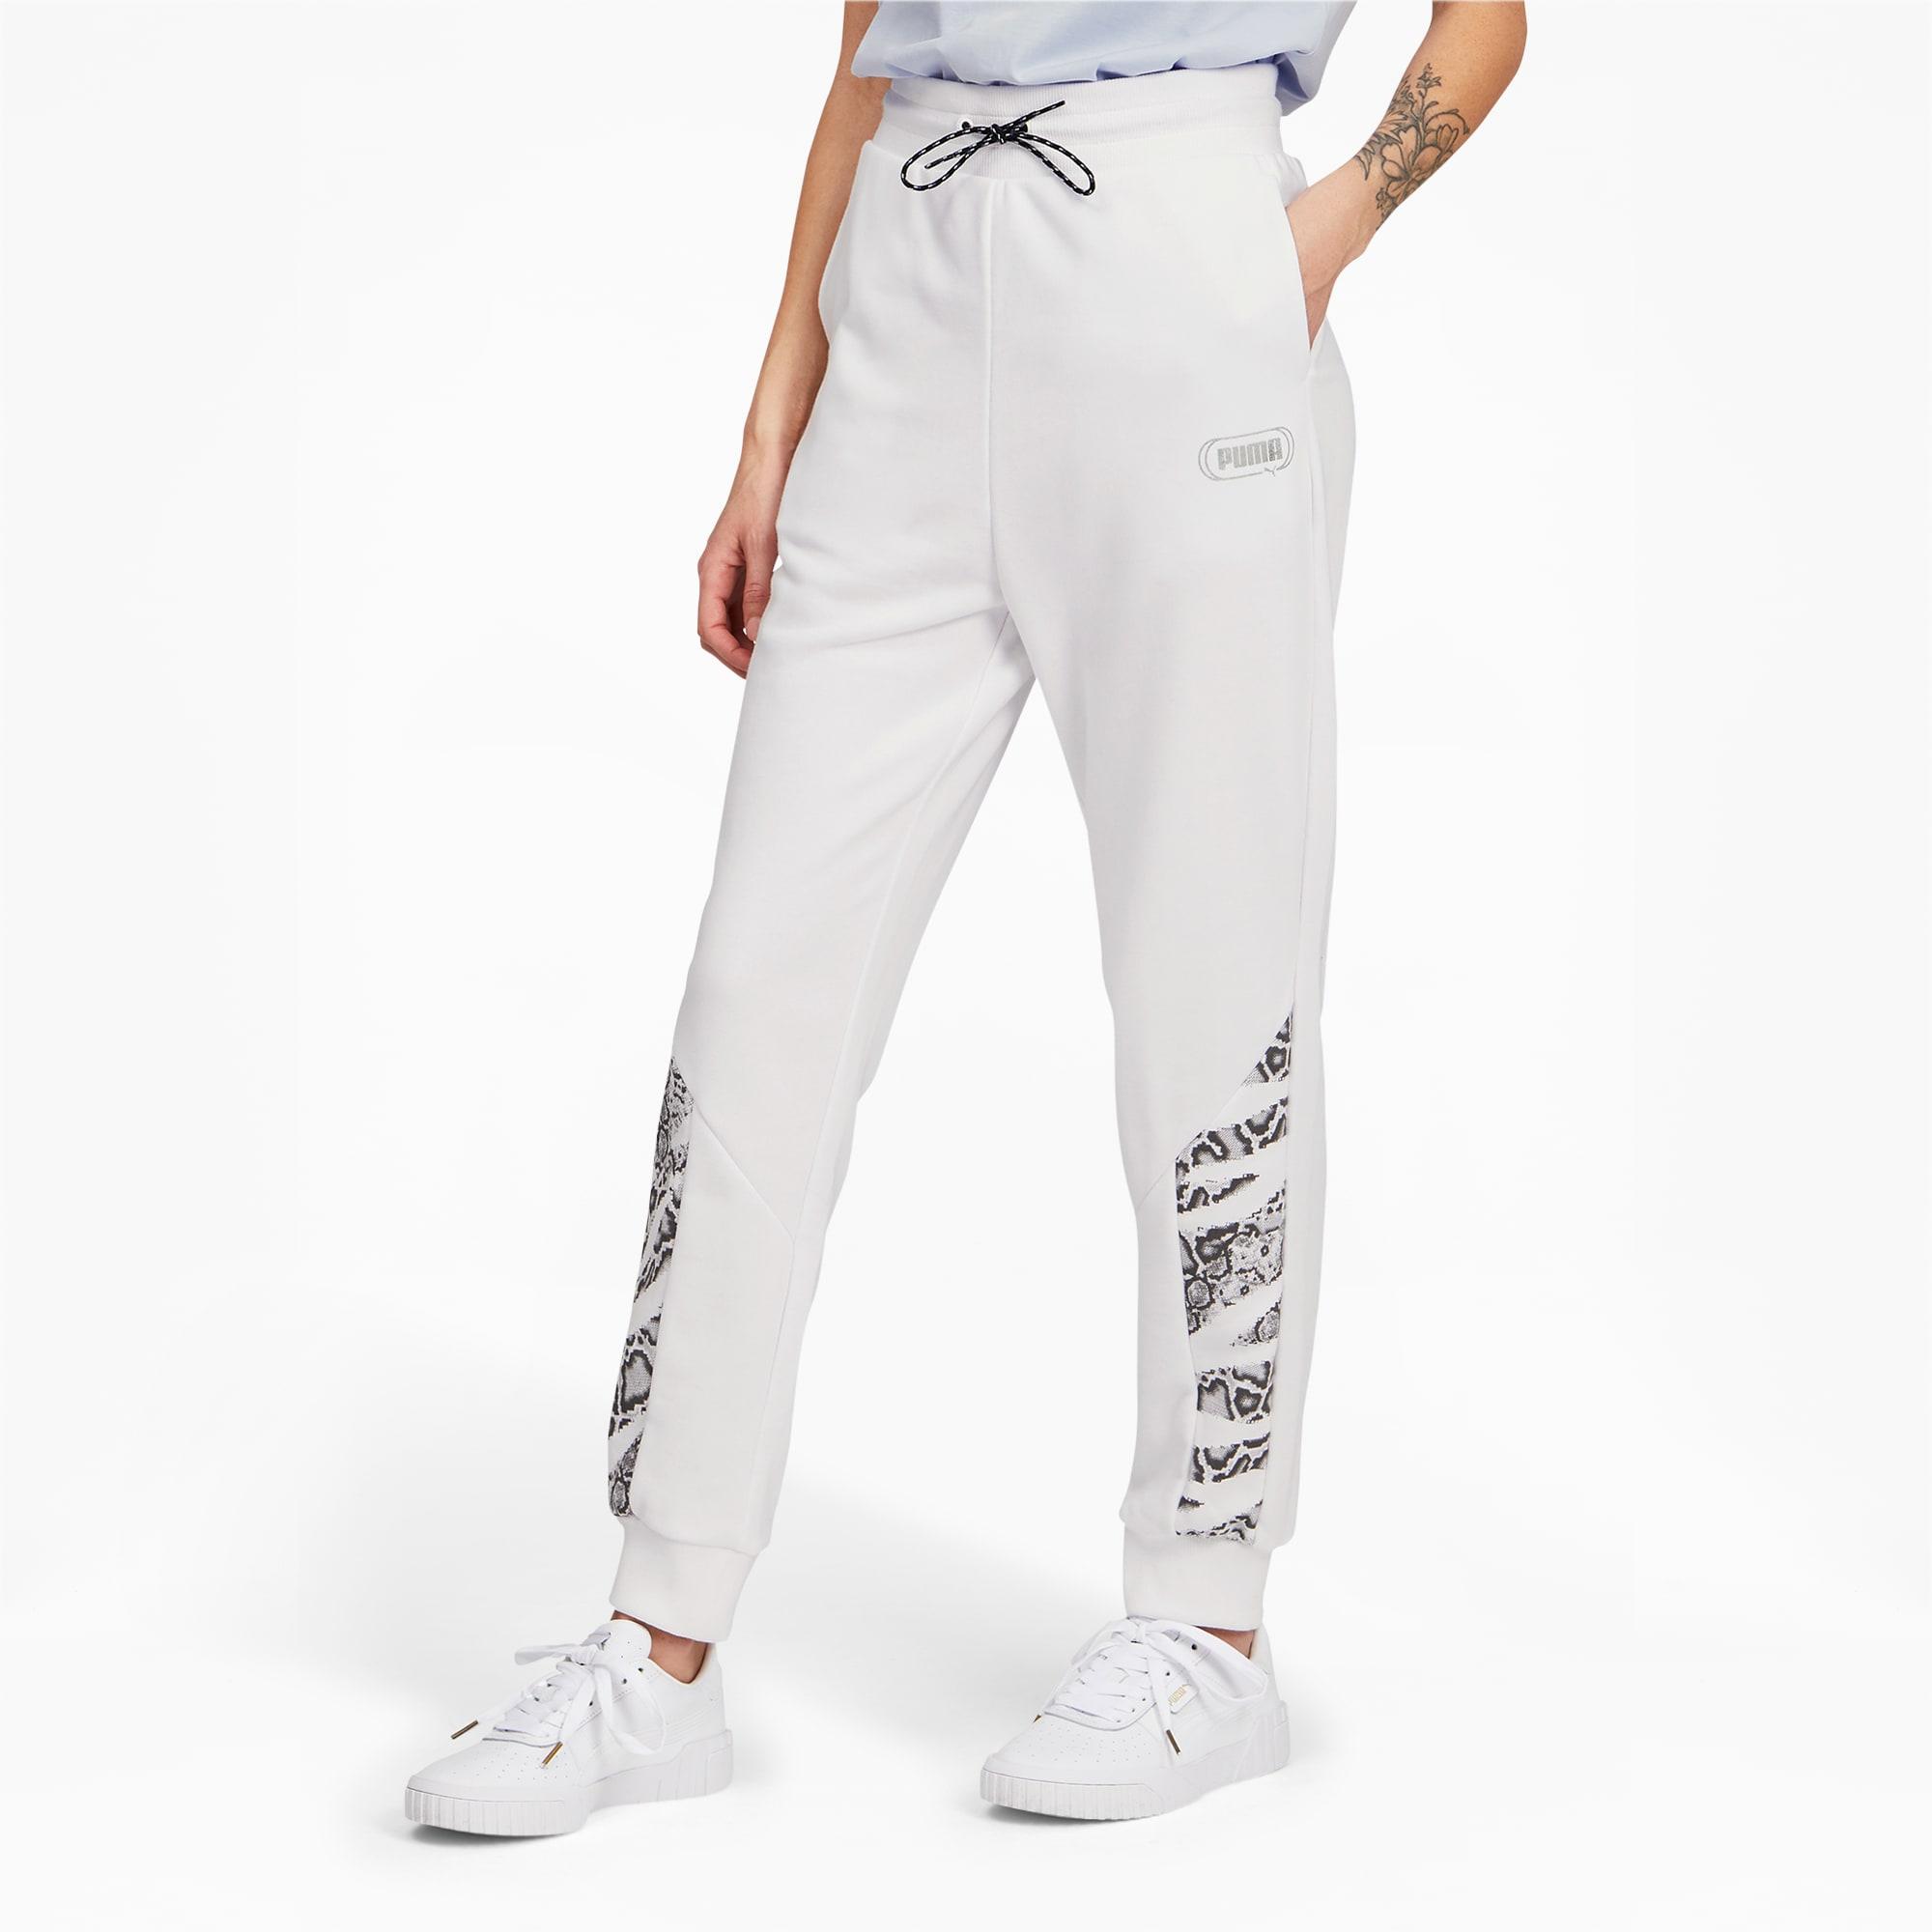 Rebel Women's High Waist Sweatpants